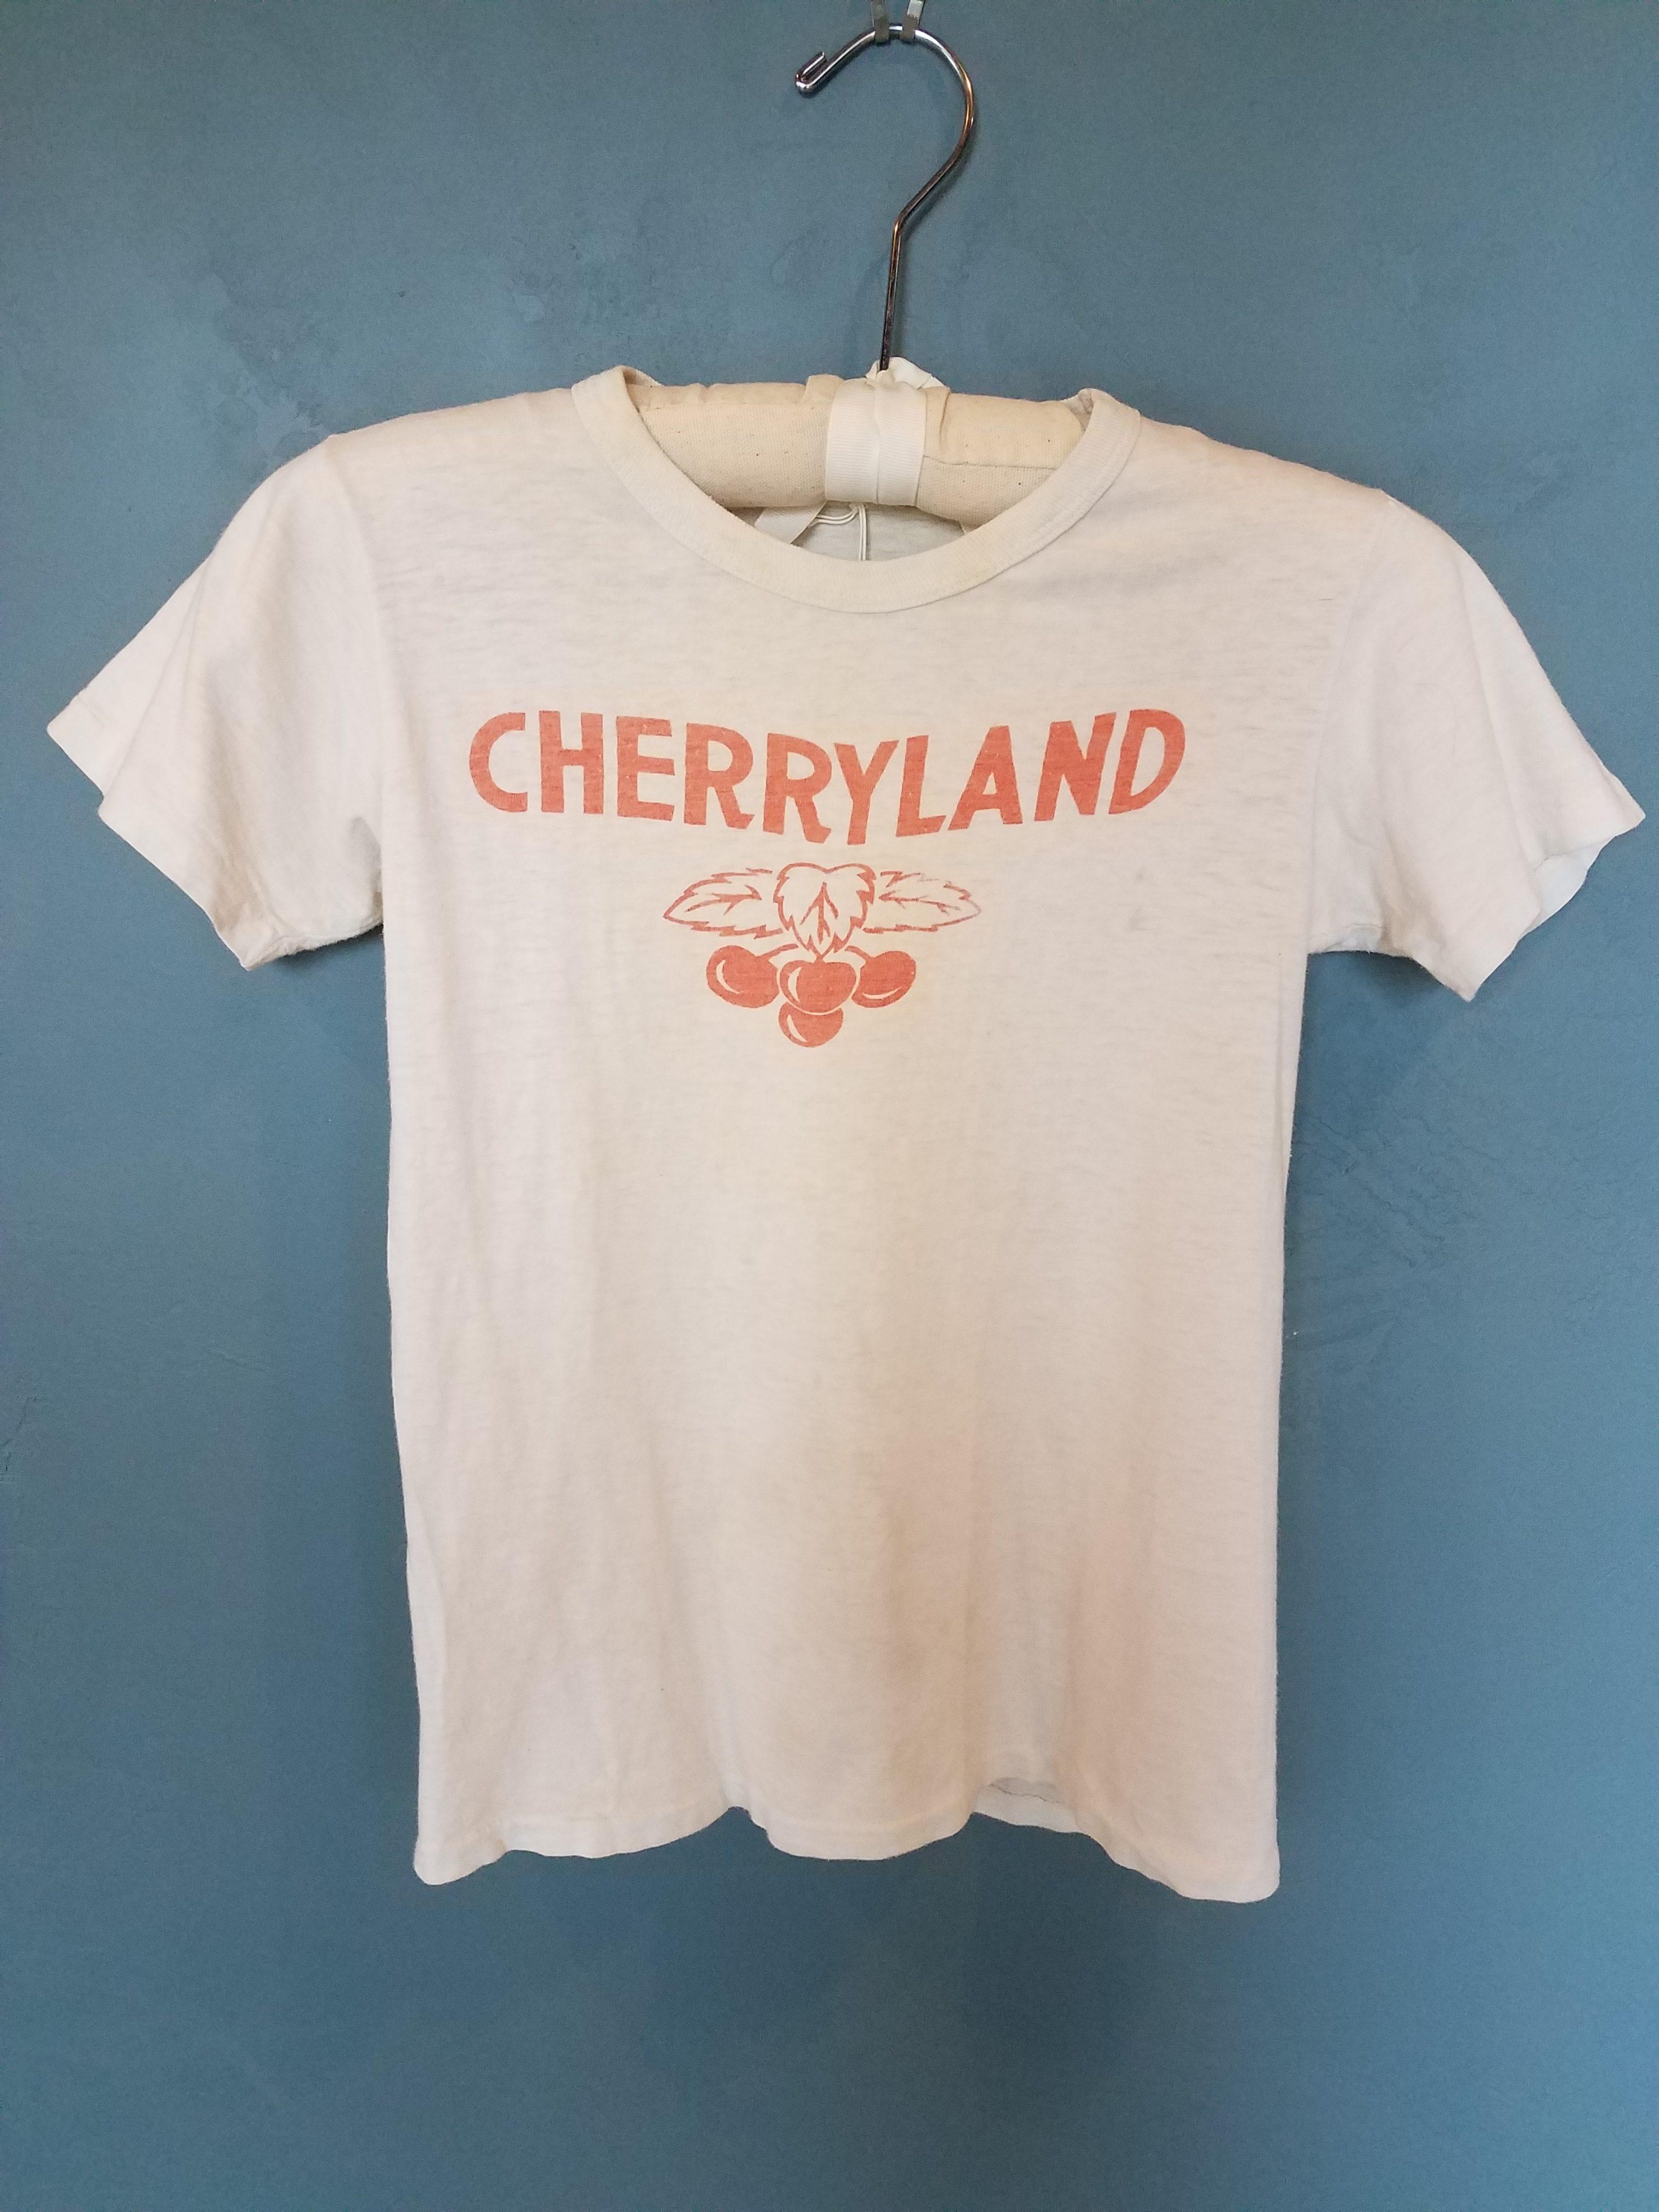 Cherryland Tshirt